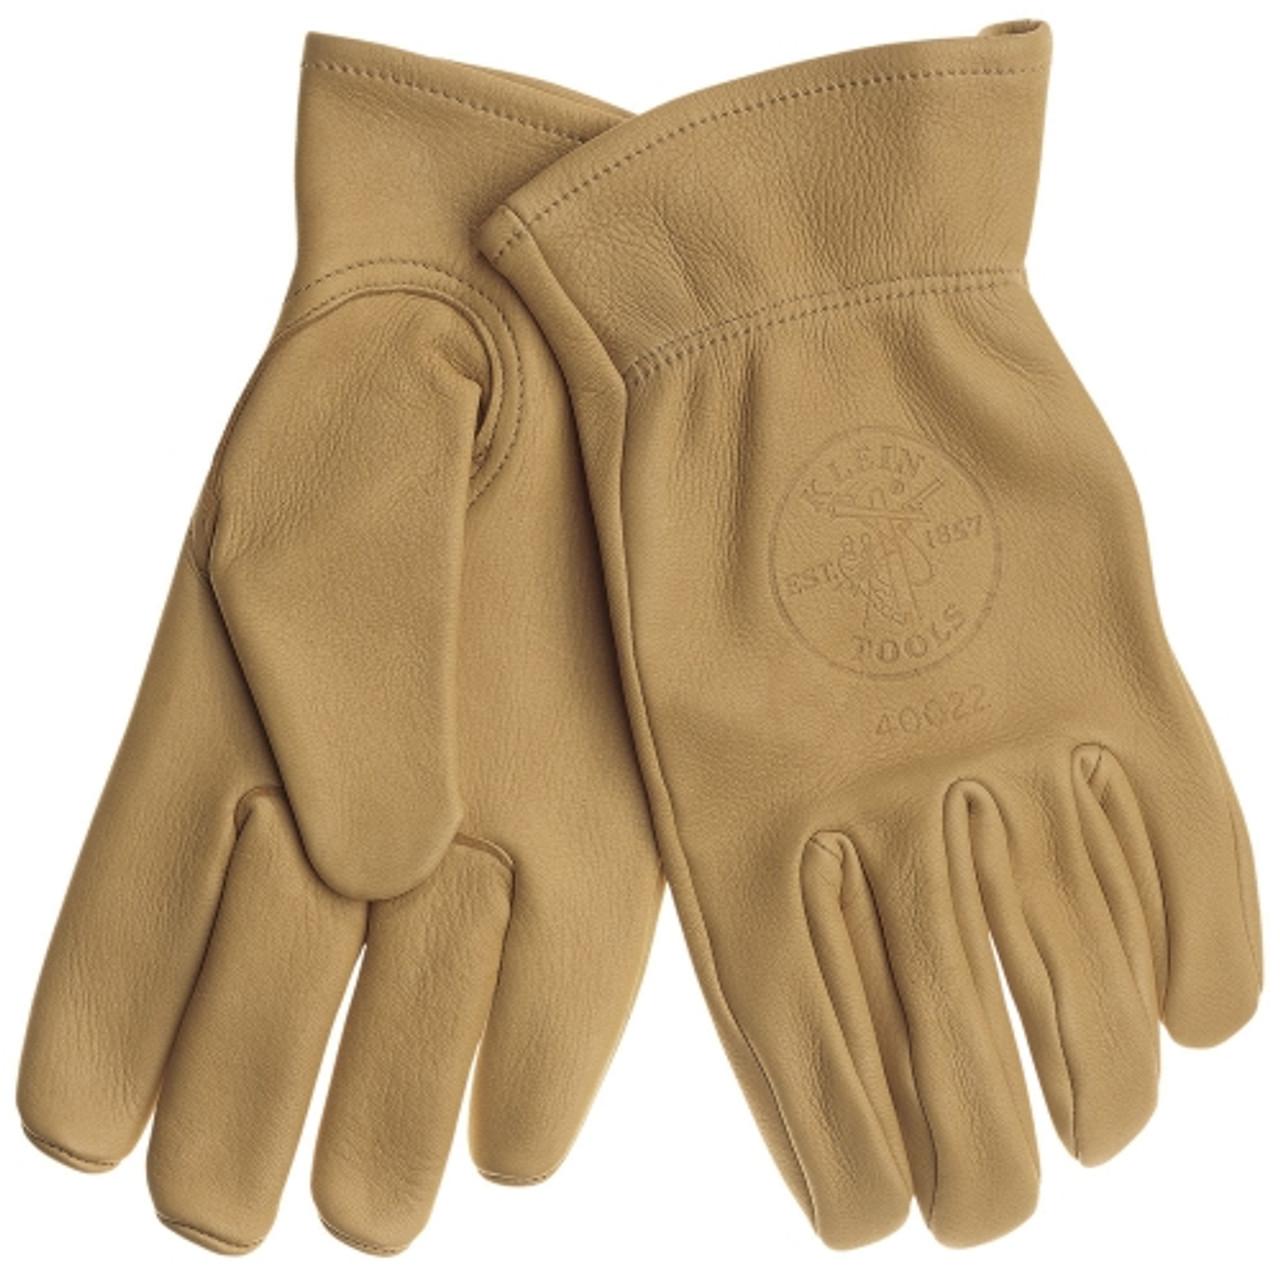 Klein 40022 Cowhide Work Gloves Large